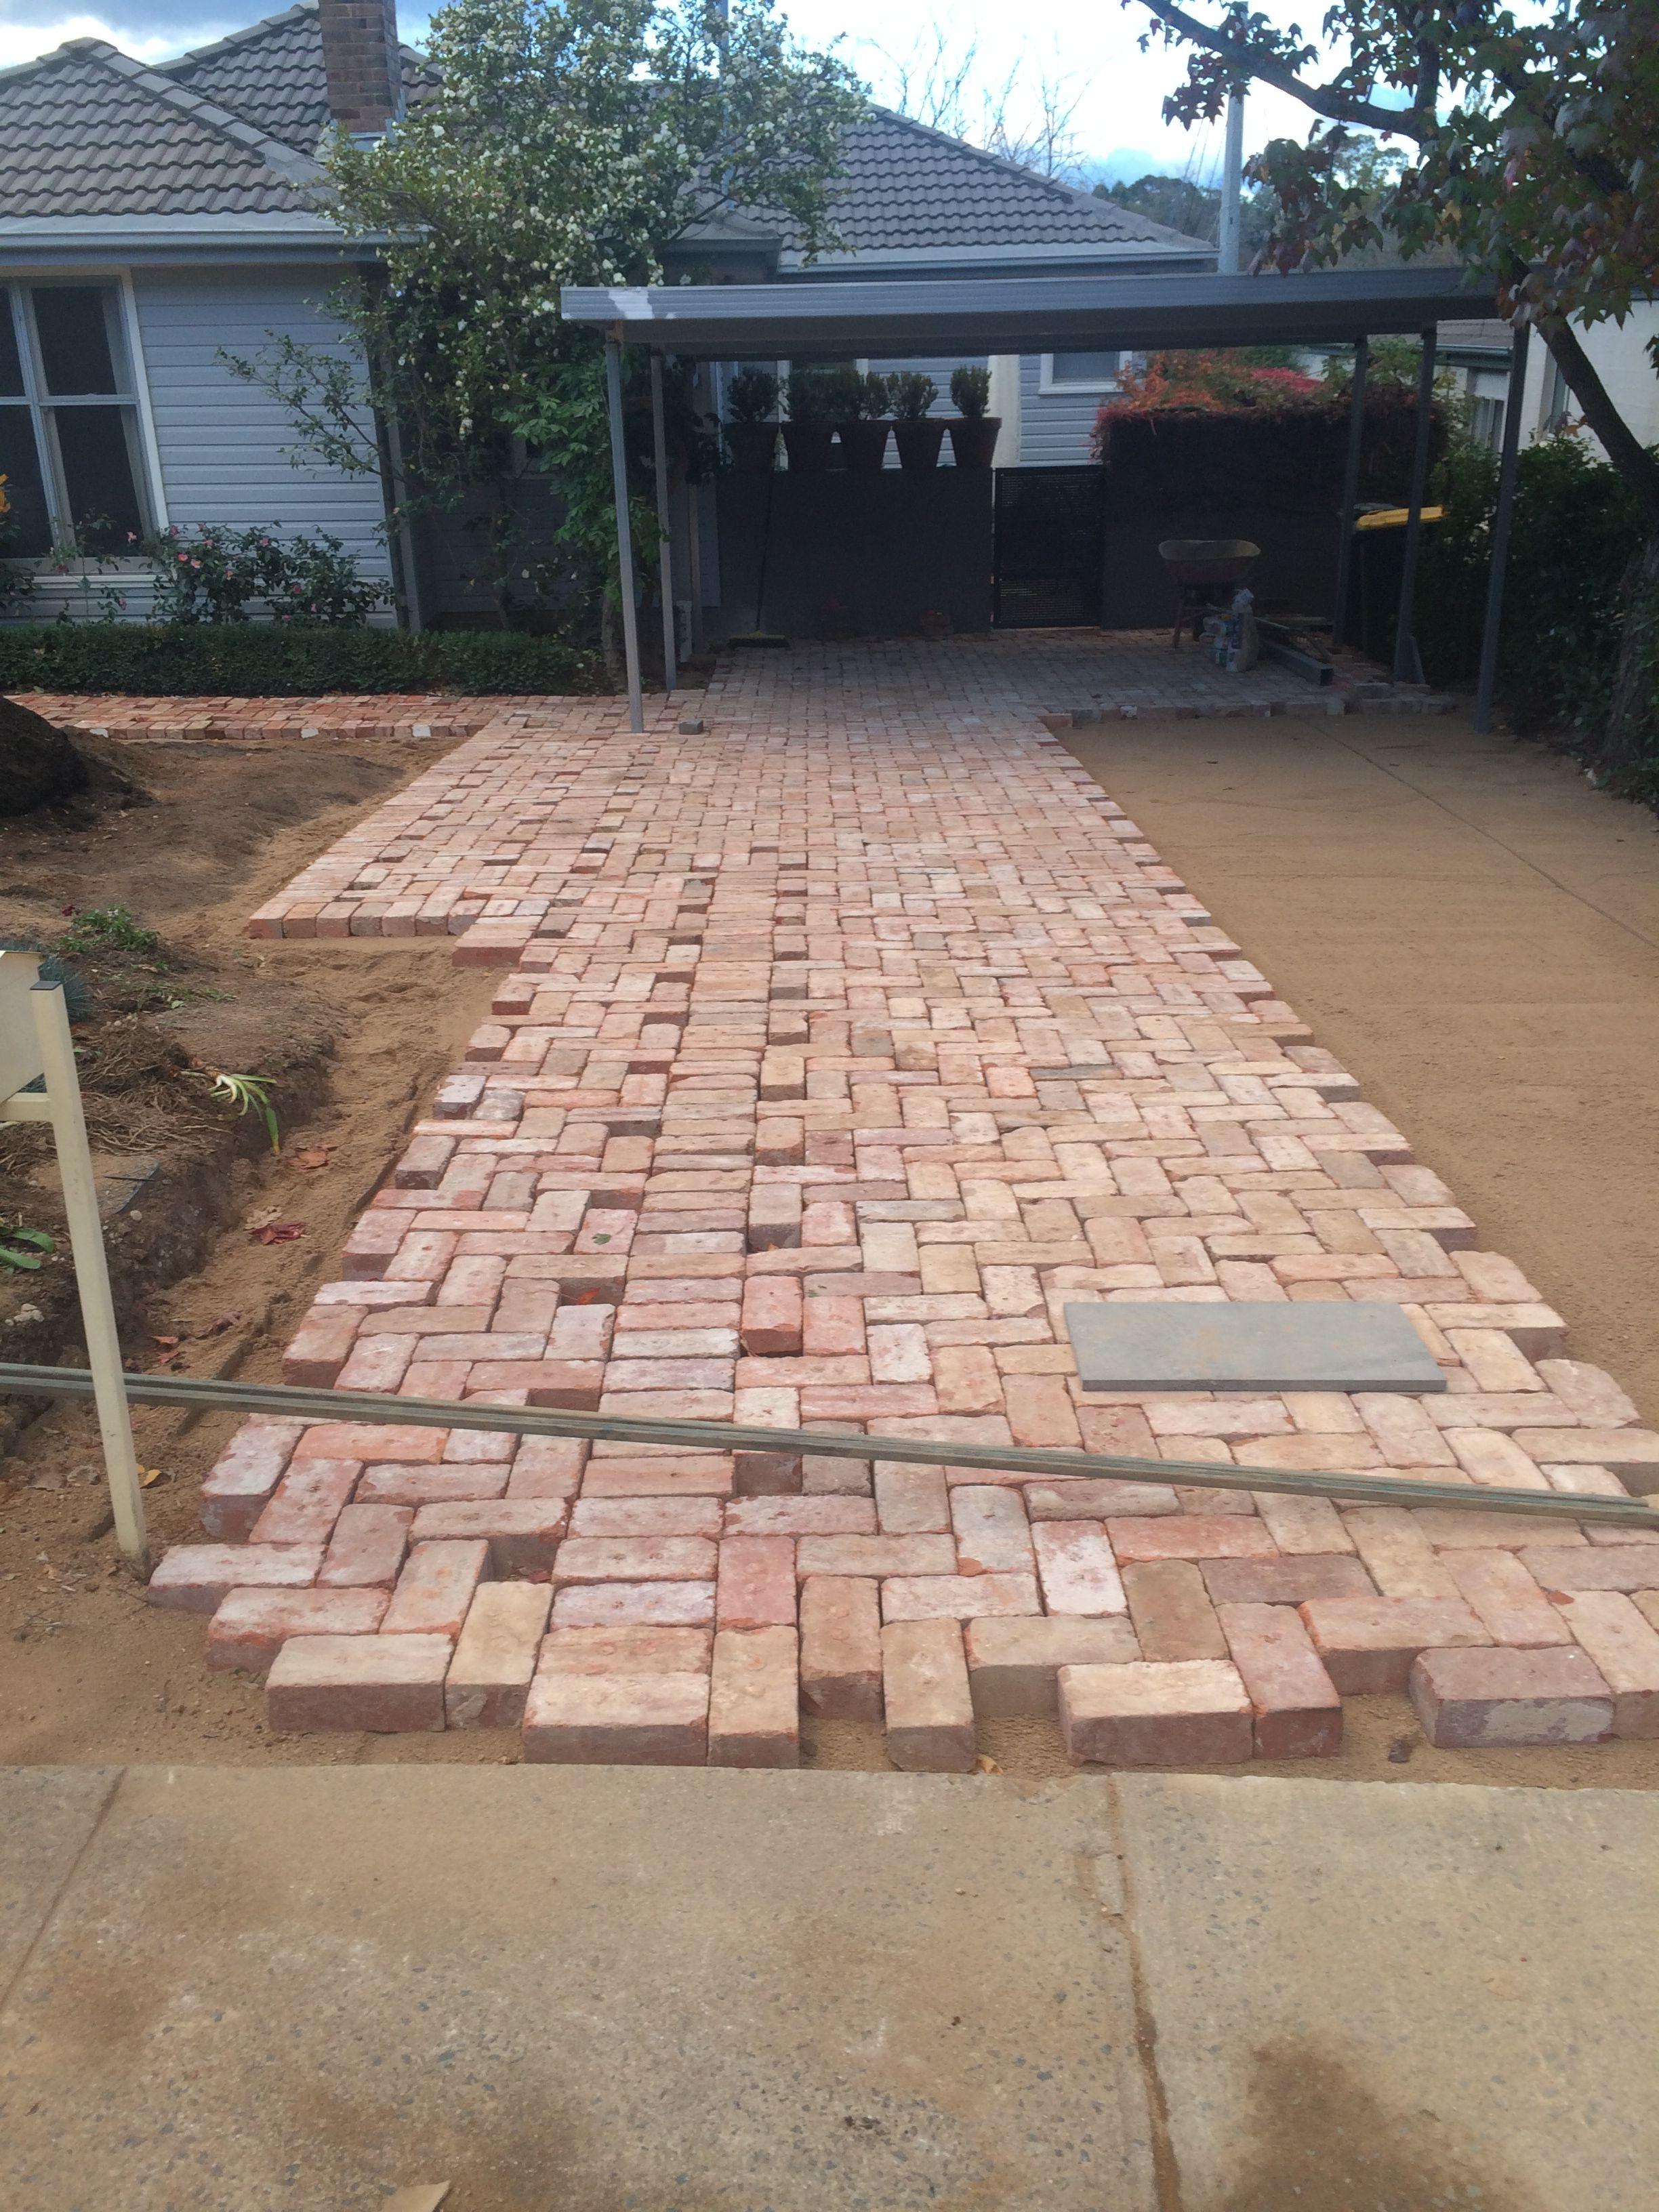 Driveway Paving Using Old Canberra Red Bricks Brick Driveway